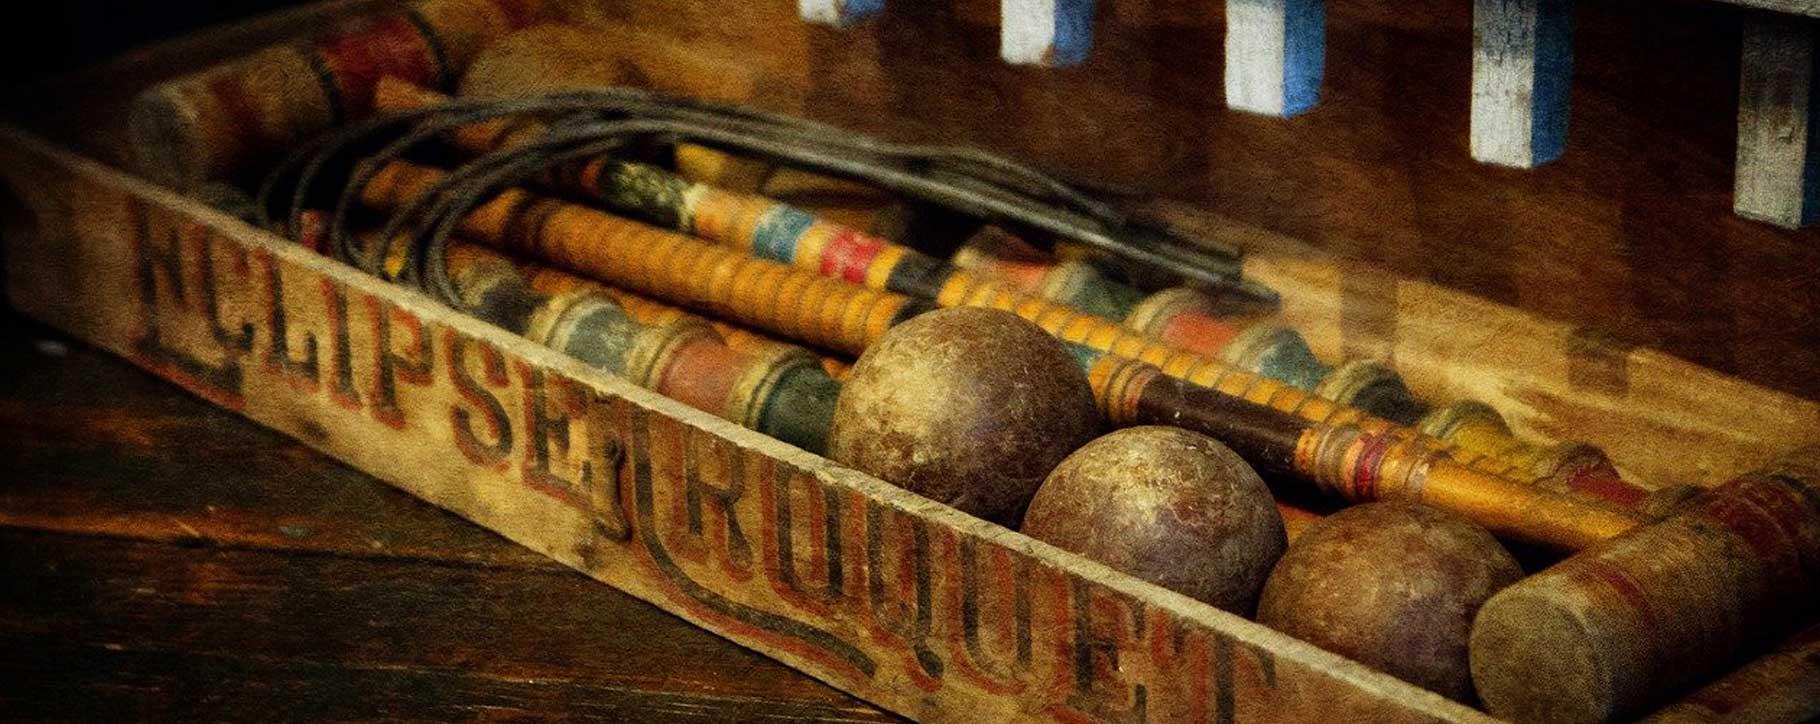 restoration of antique croquet set